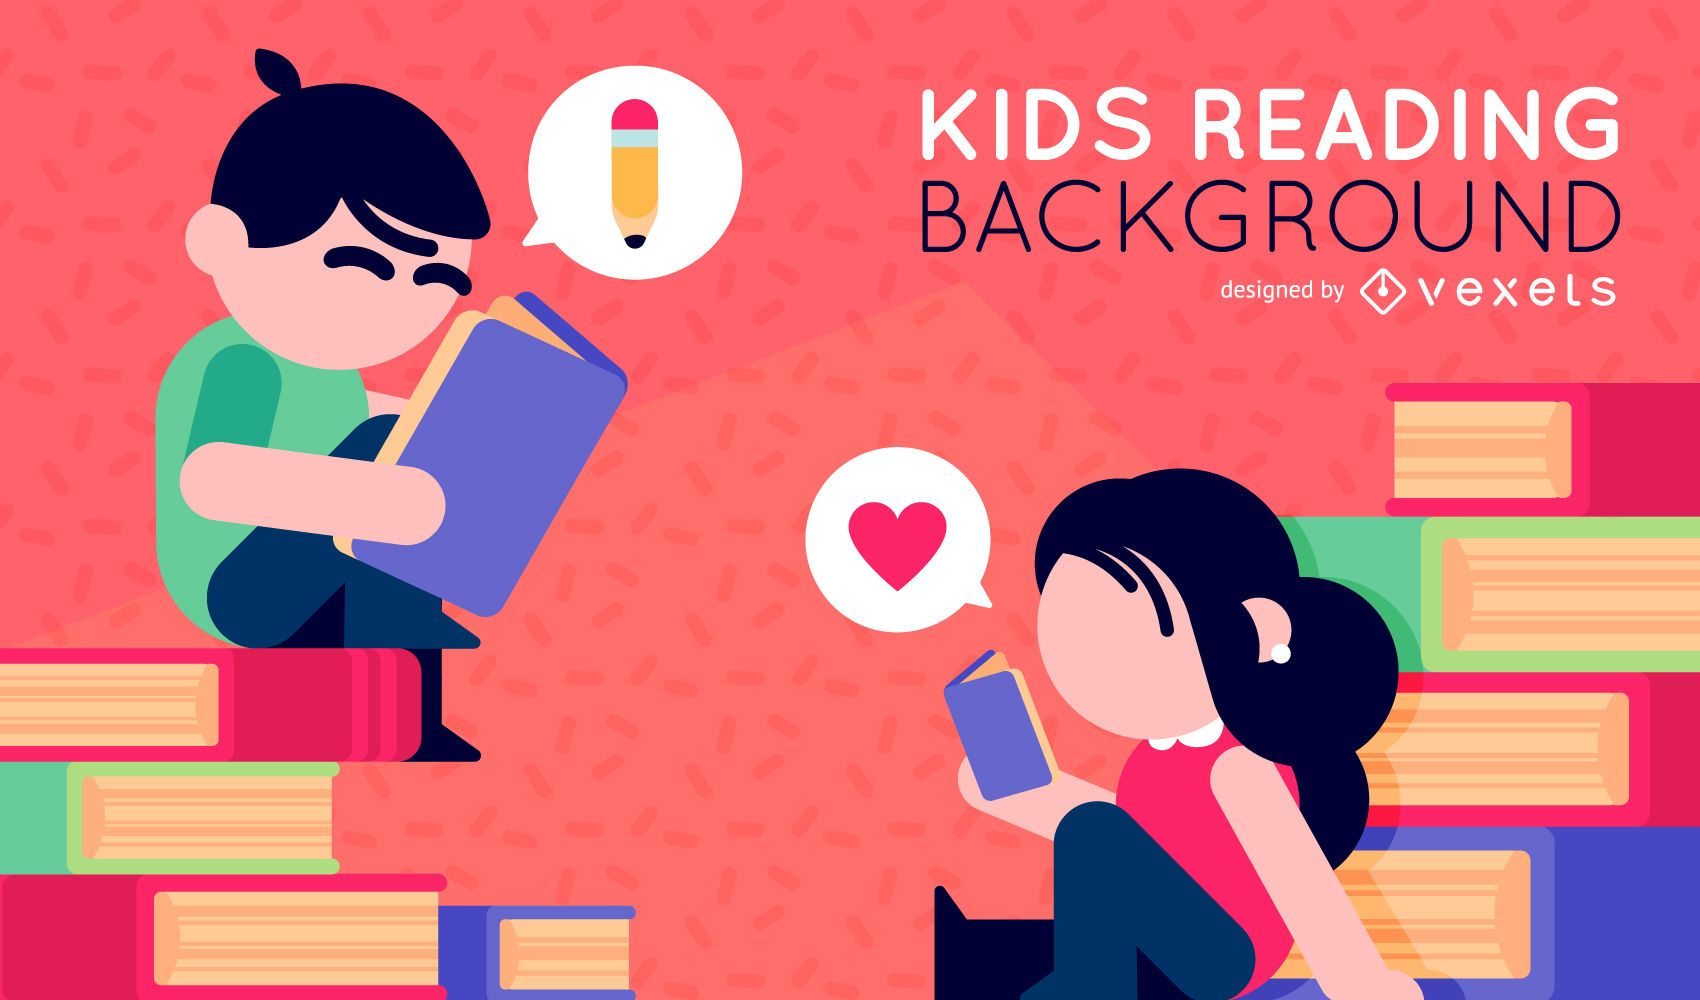 Ni?os ilustrados leyendo libros.